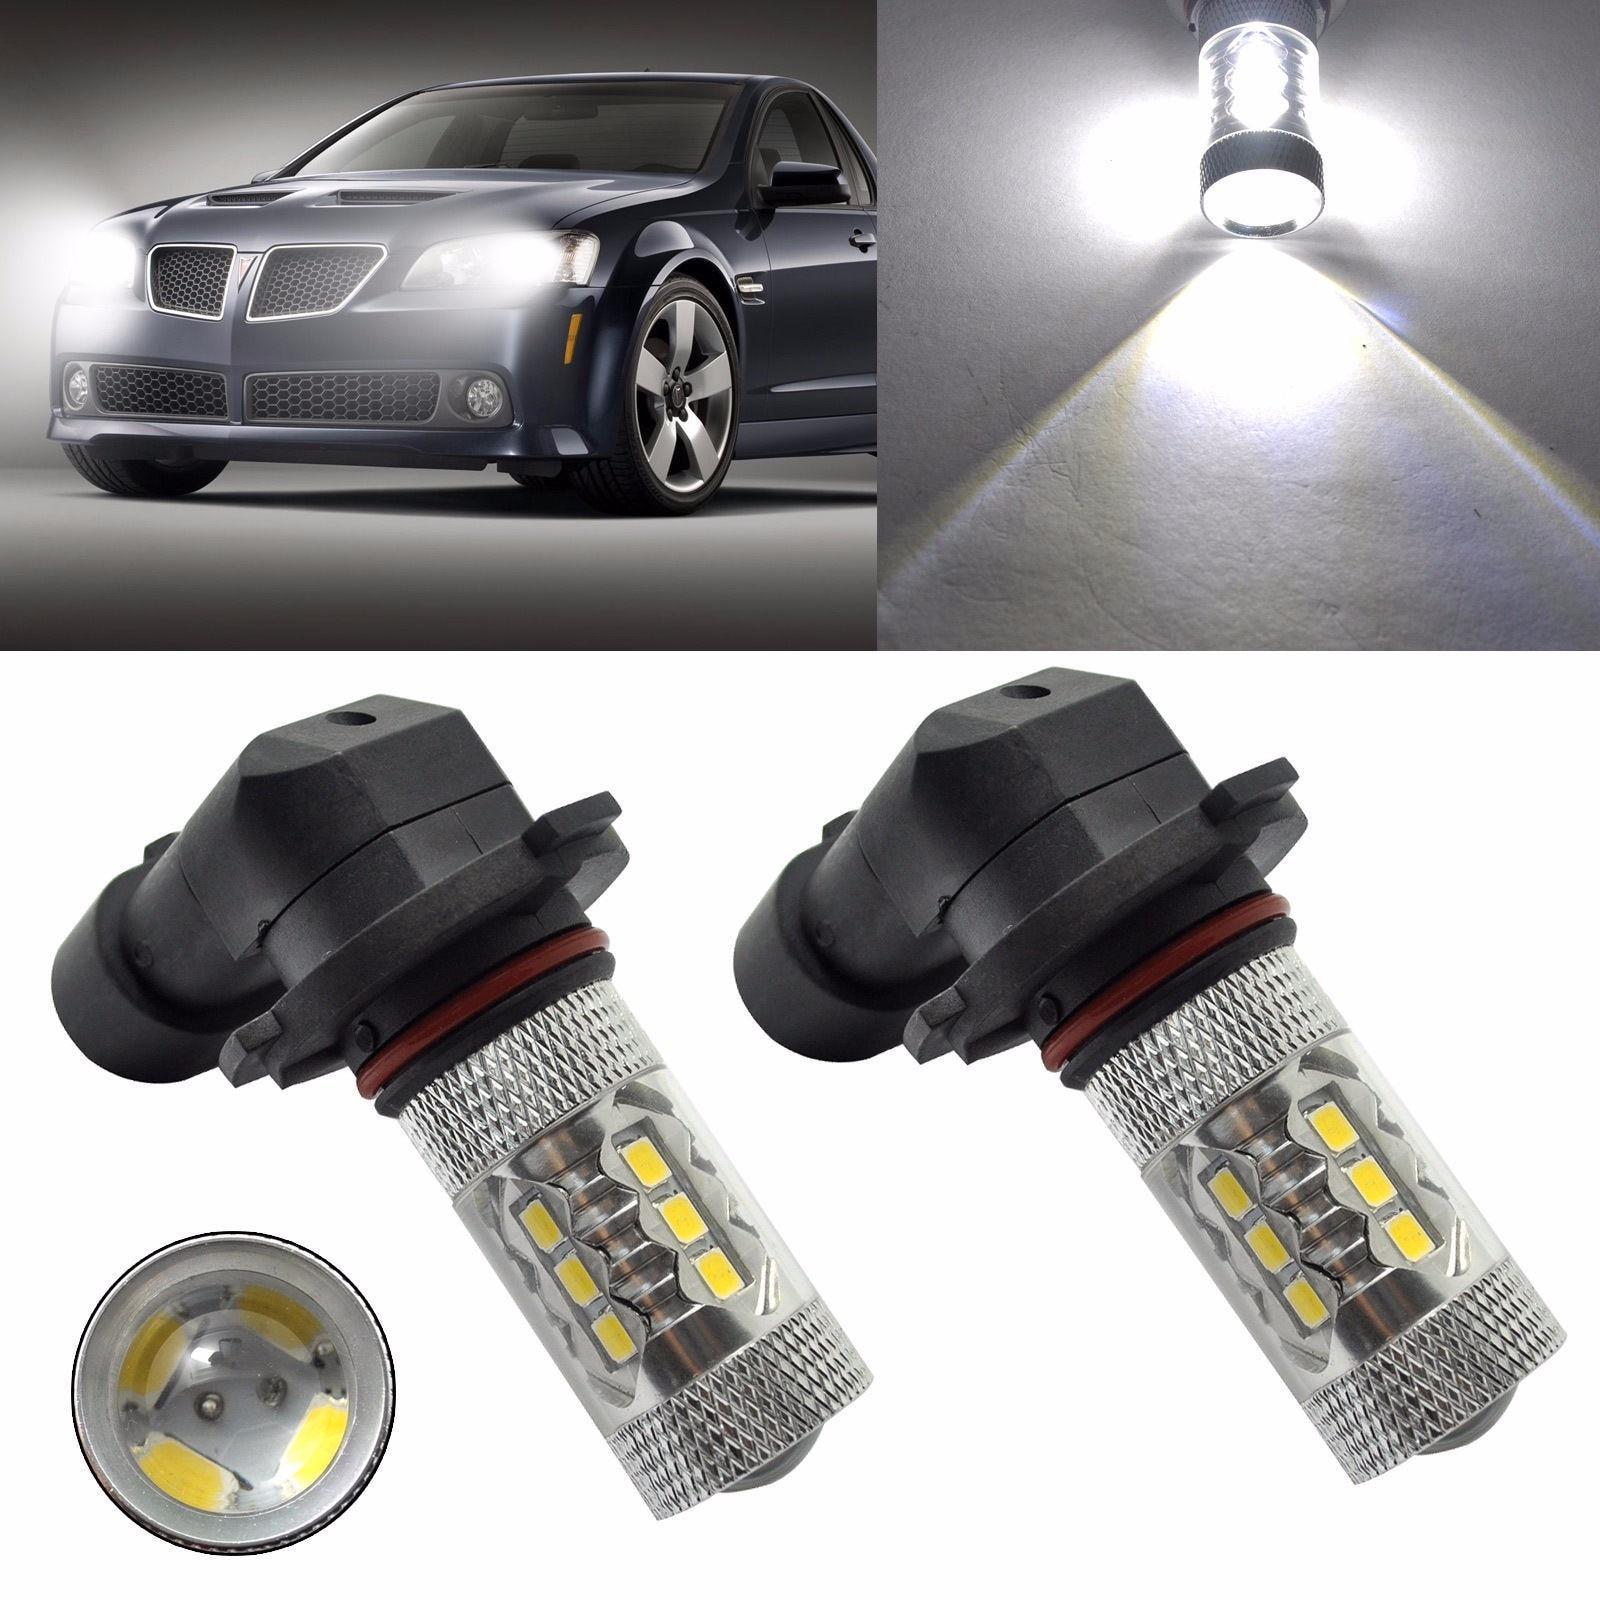 Car Fog Lamp Waterproof 2pc 9006 HB4 2323 SMD 80W LED High Power 6000K Fog Driving